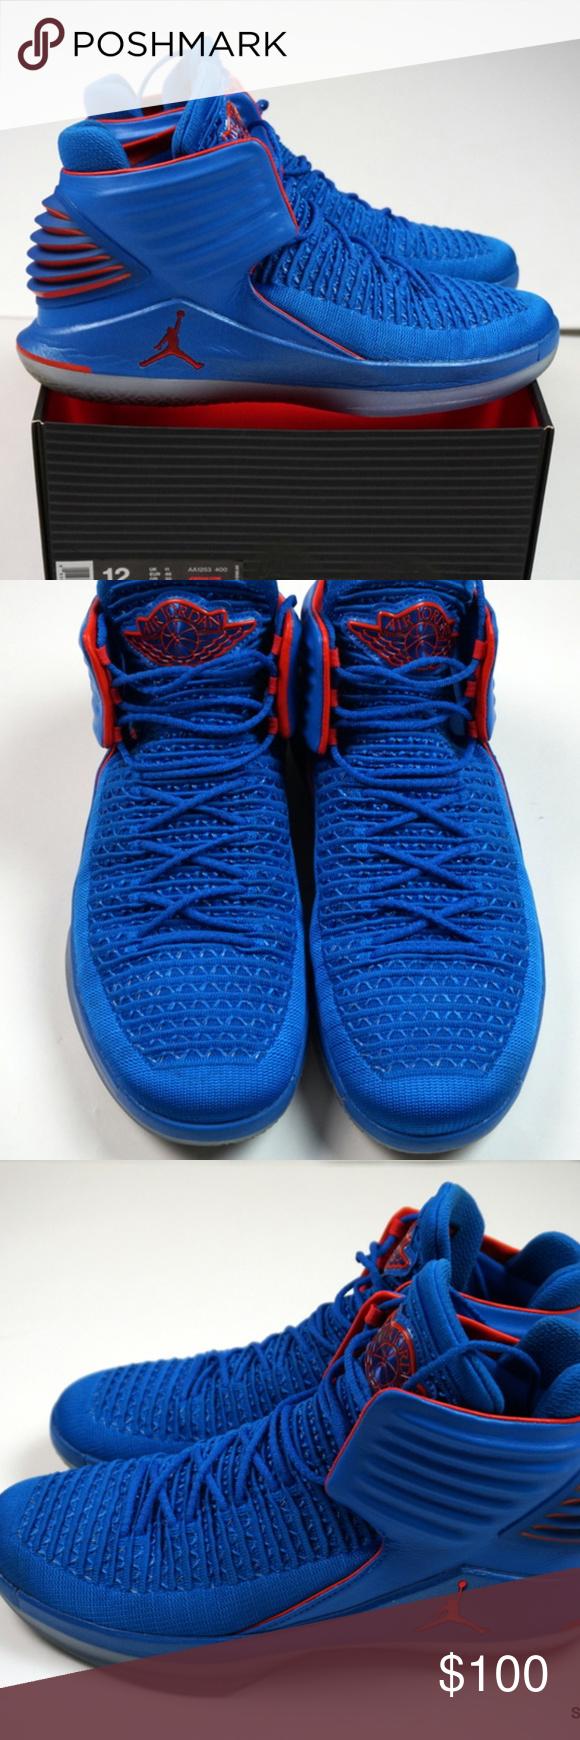 f539cf92f602 Nike Air Jordan XXXII 32 Why Not Shoes Men s Sz 12 Nike Air Jordan XXXII 32  AA1253-400 Russell Westbrook